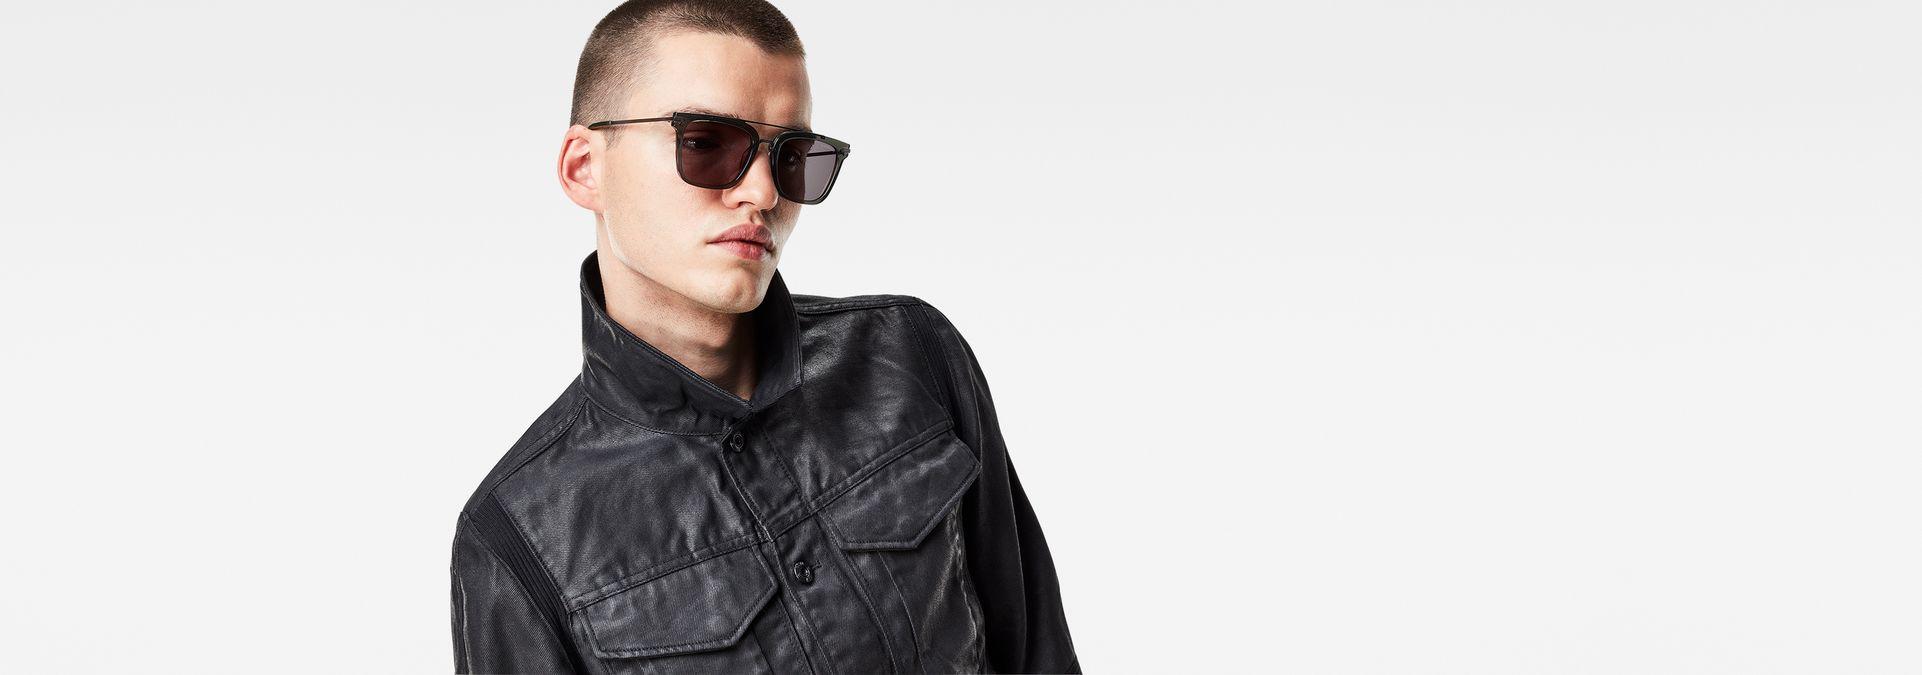 4ead08ac873 ... G-Star RAW® Combo Eehro Sunglasses Grey ...